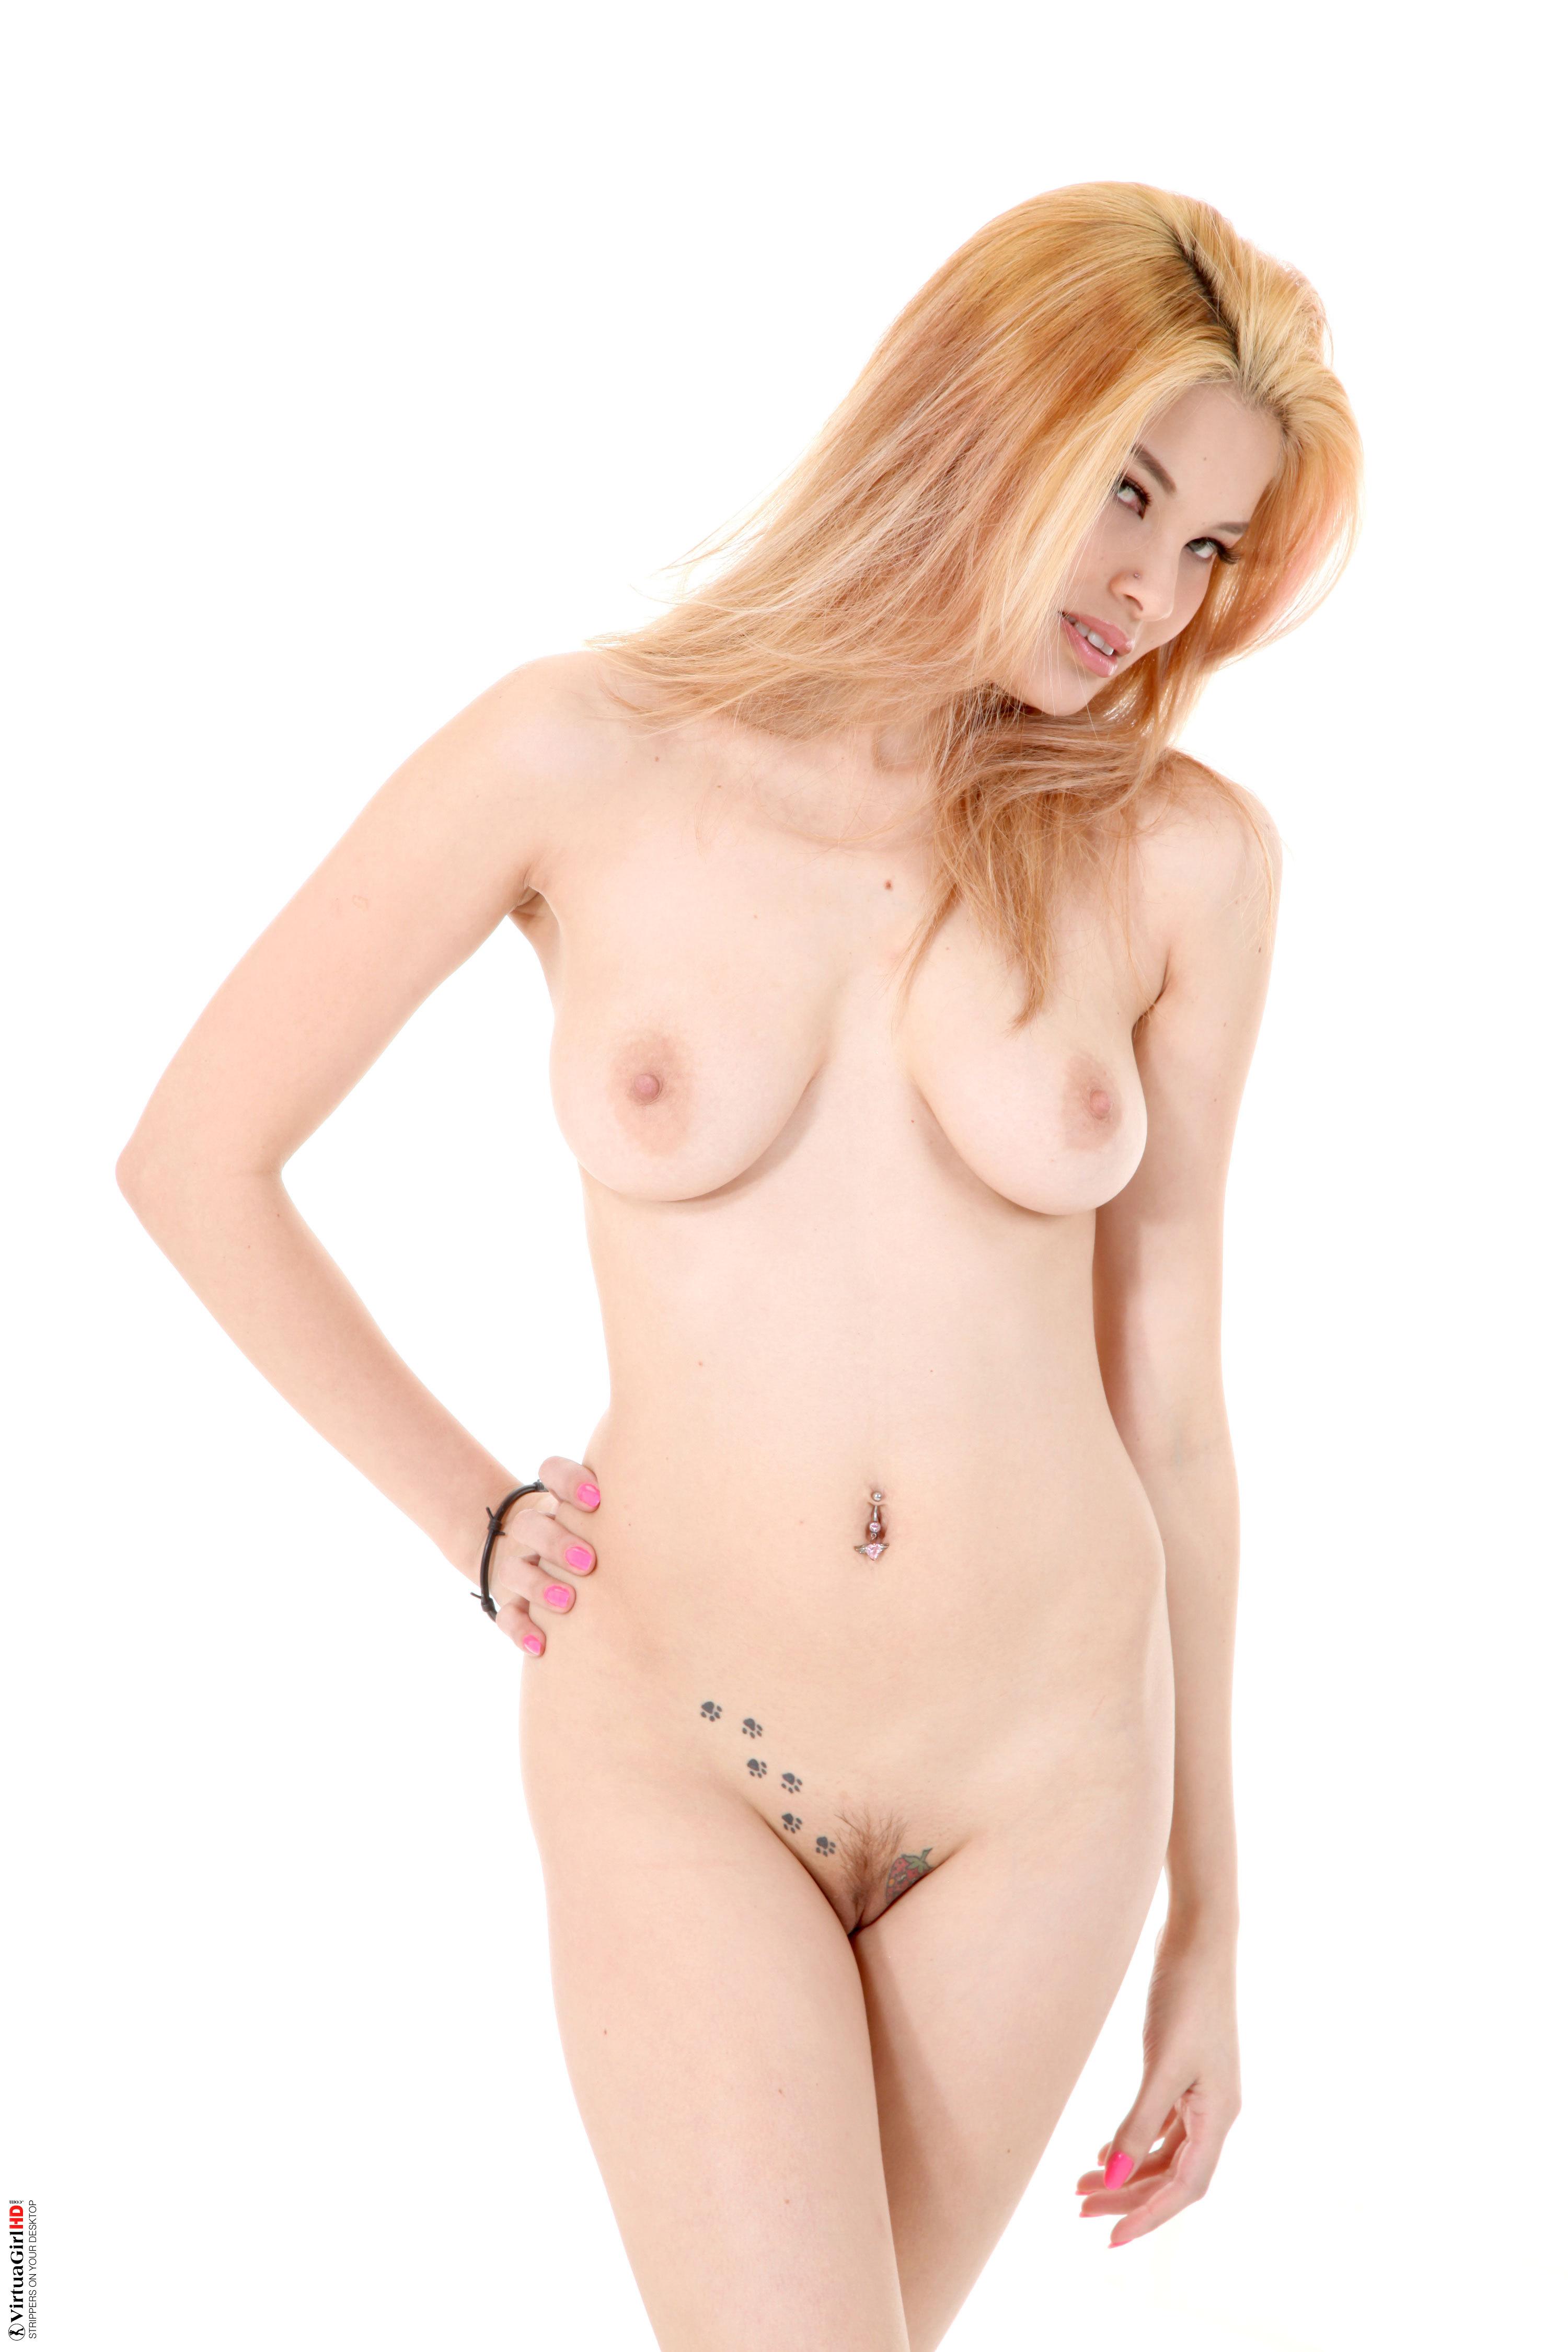 girls aloud stripping